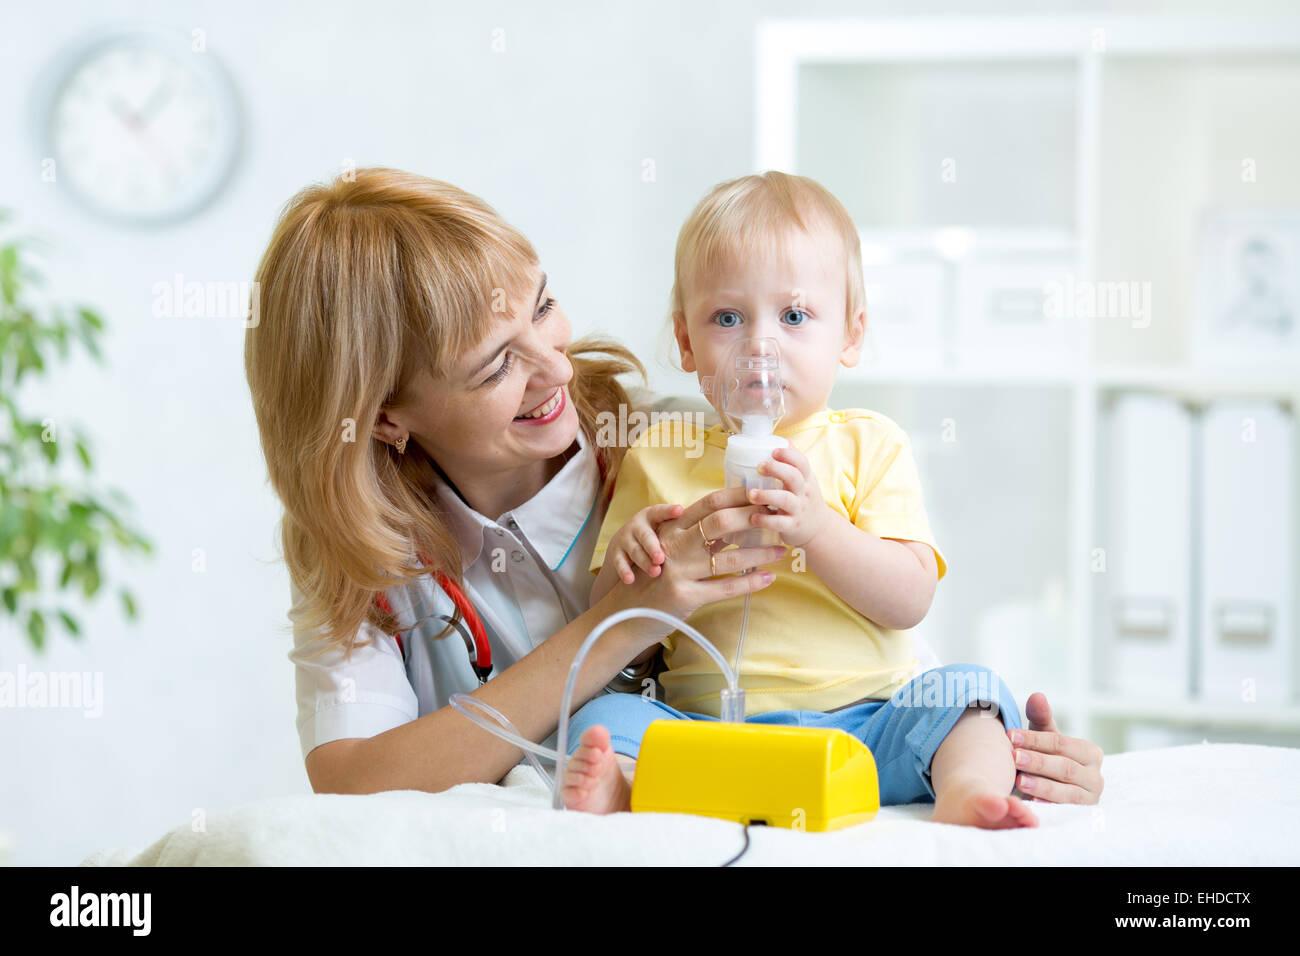 Doctor holding inhaler mask for child breathing - Stock Image